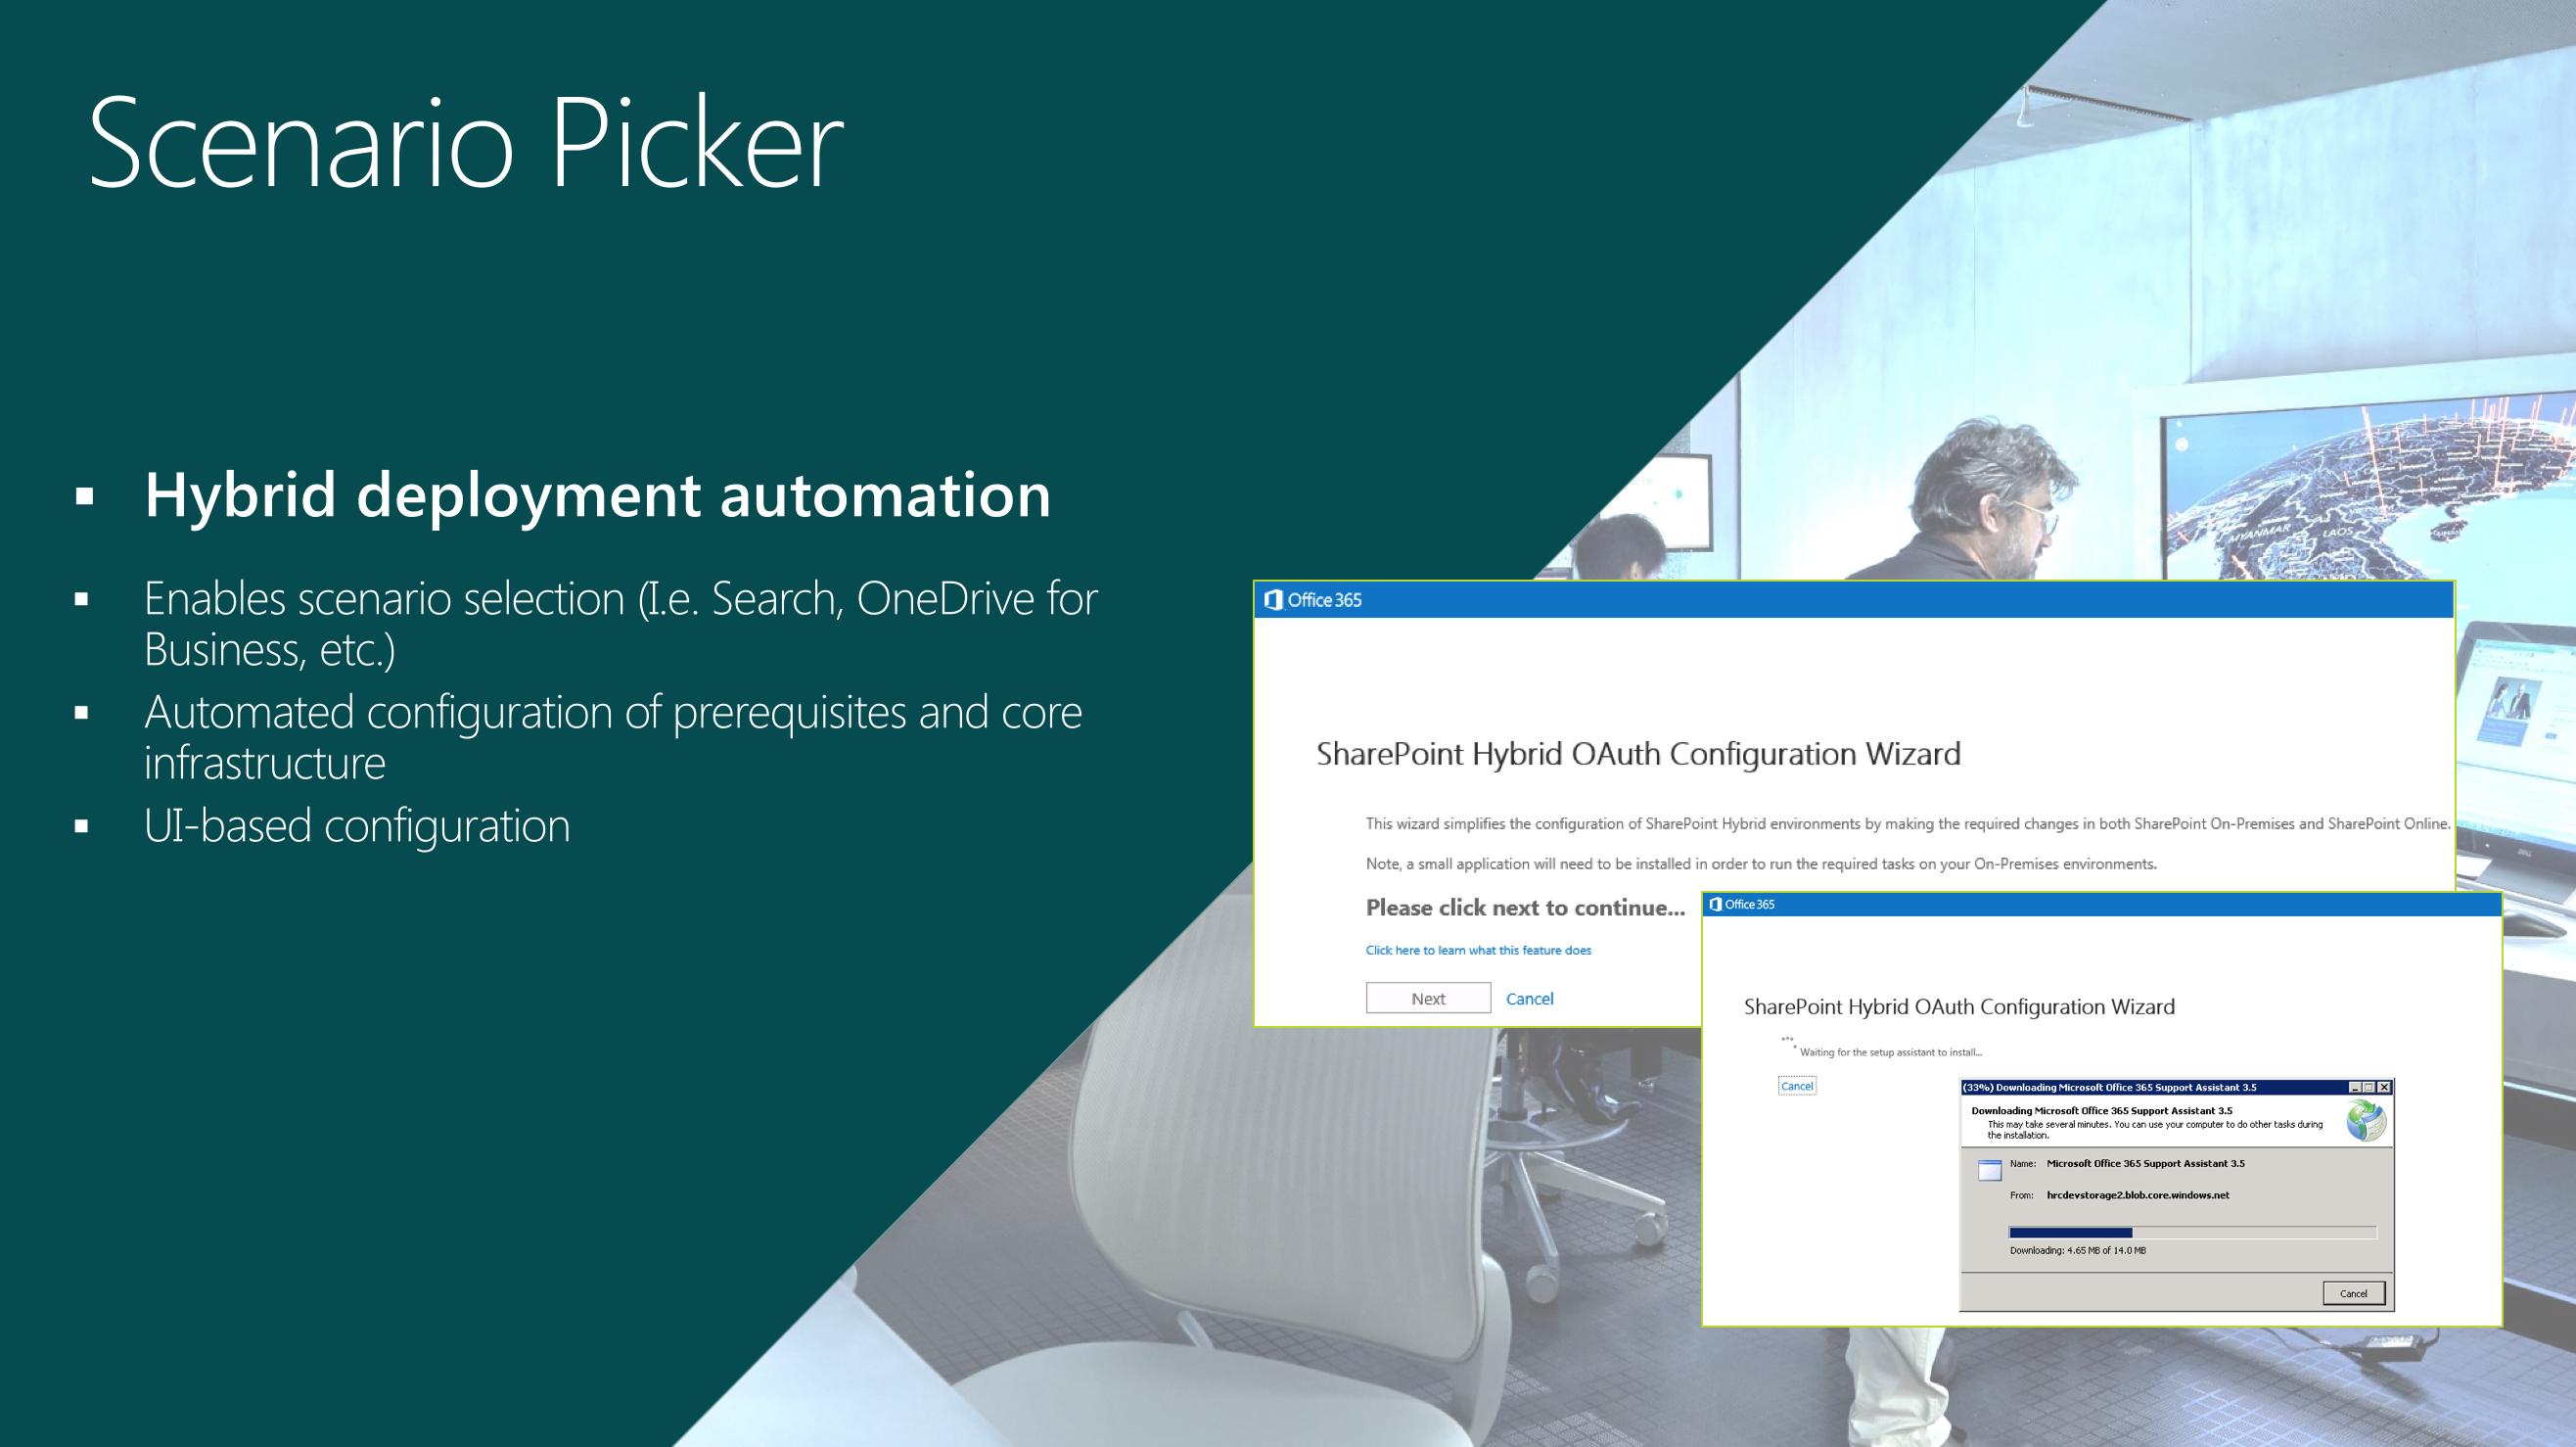 SharePoint 2016 scenario picker